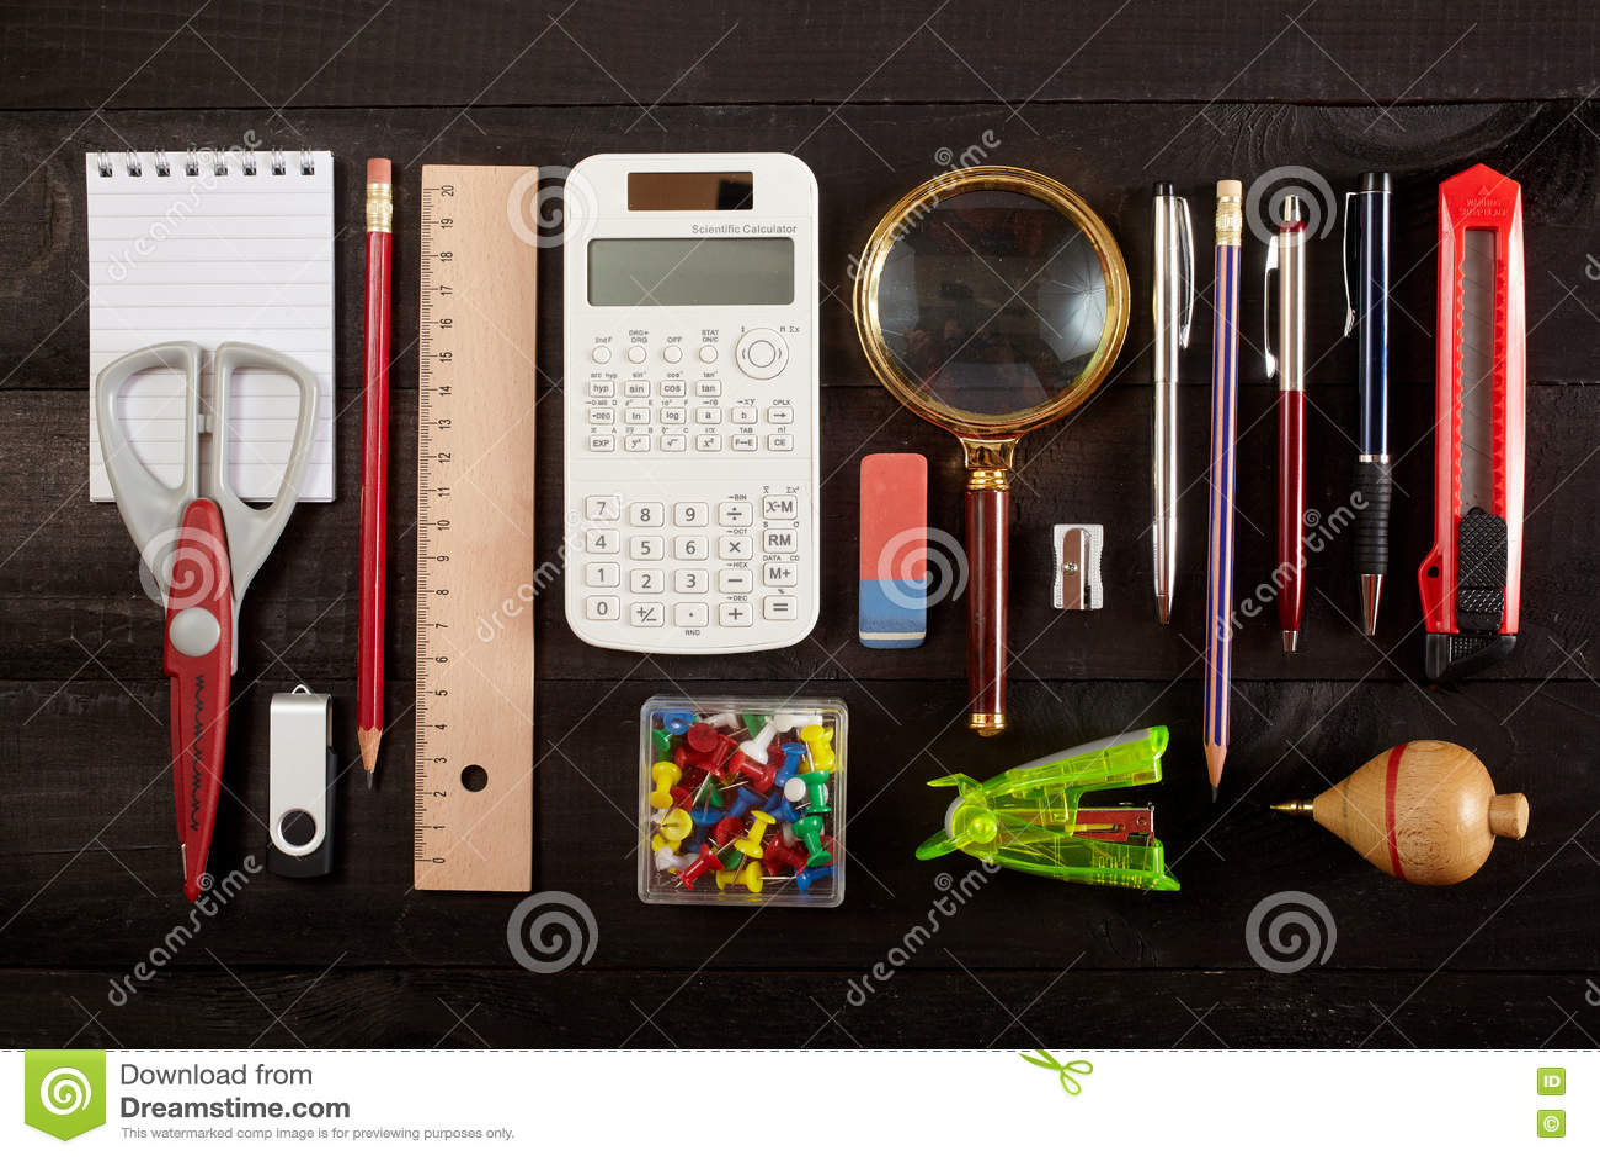 Electronic calculator scissors protractor sharpener cutter pencil.